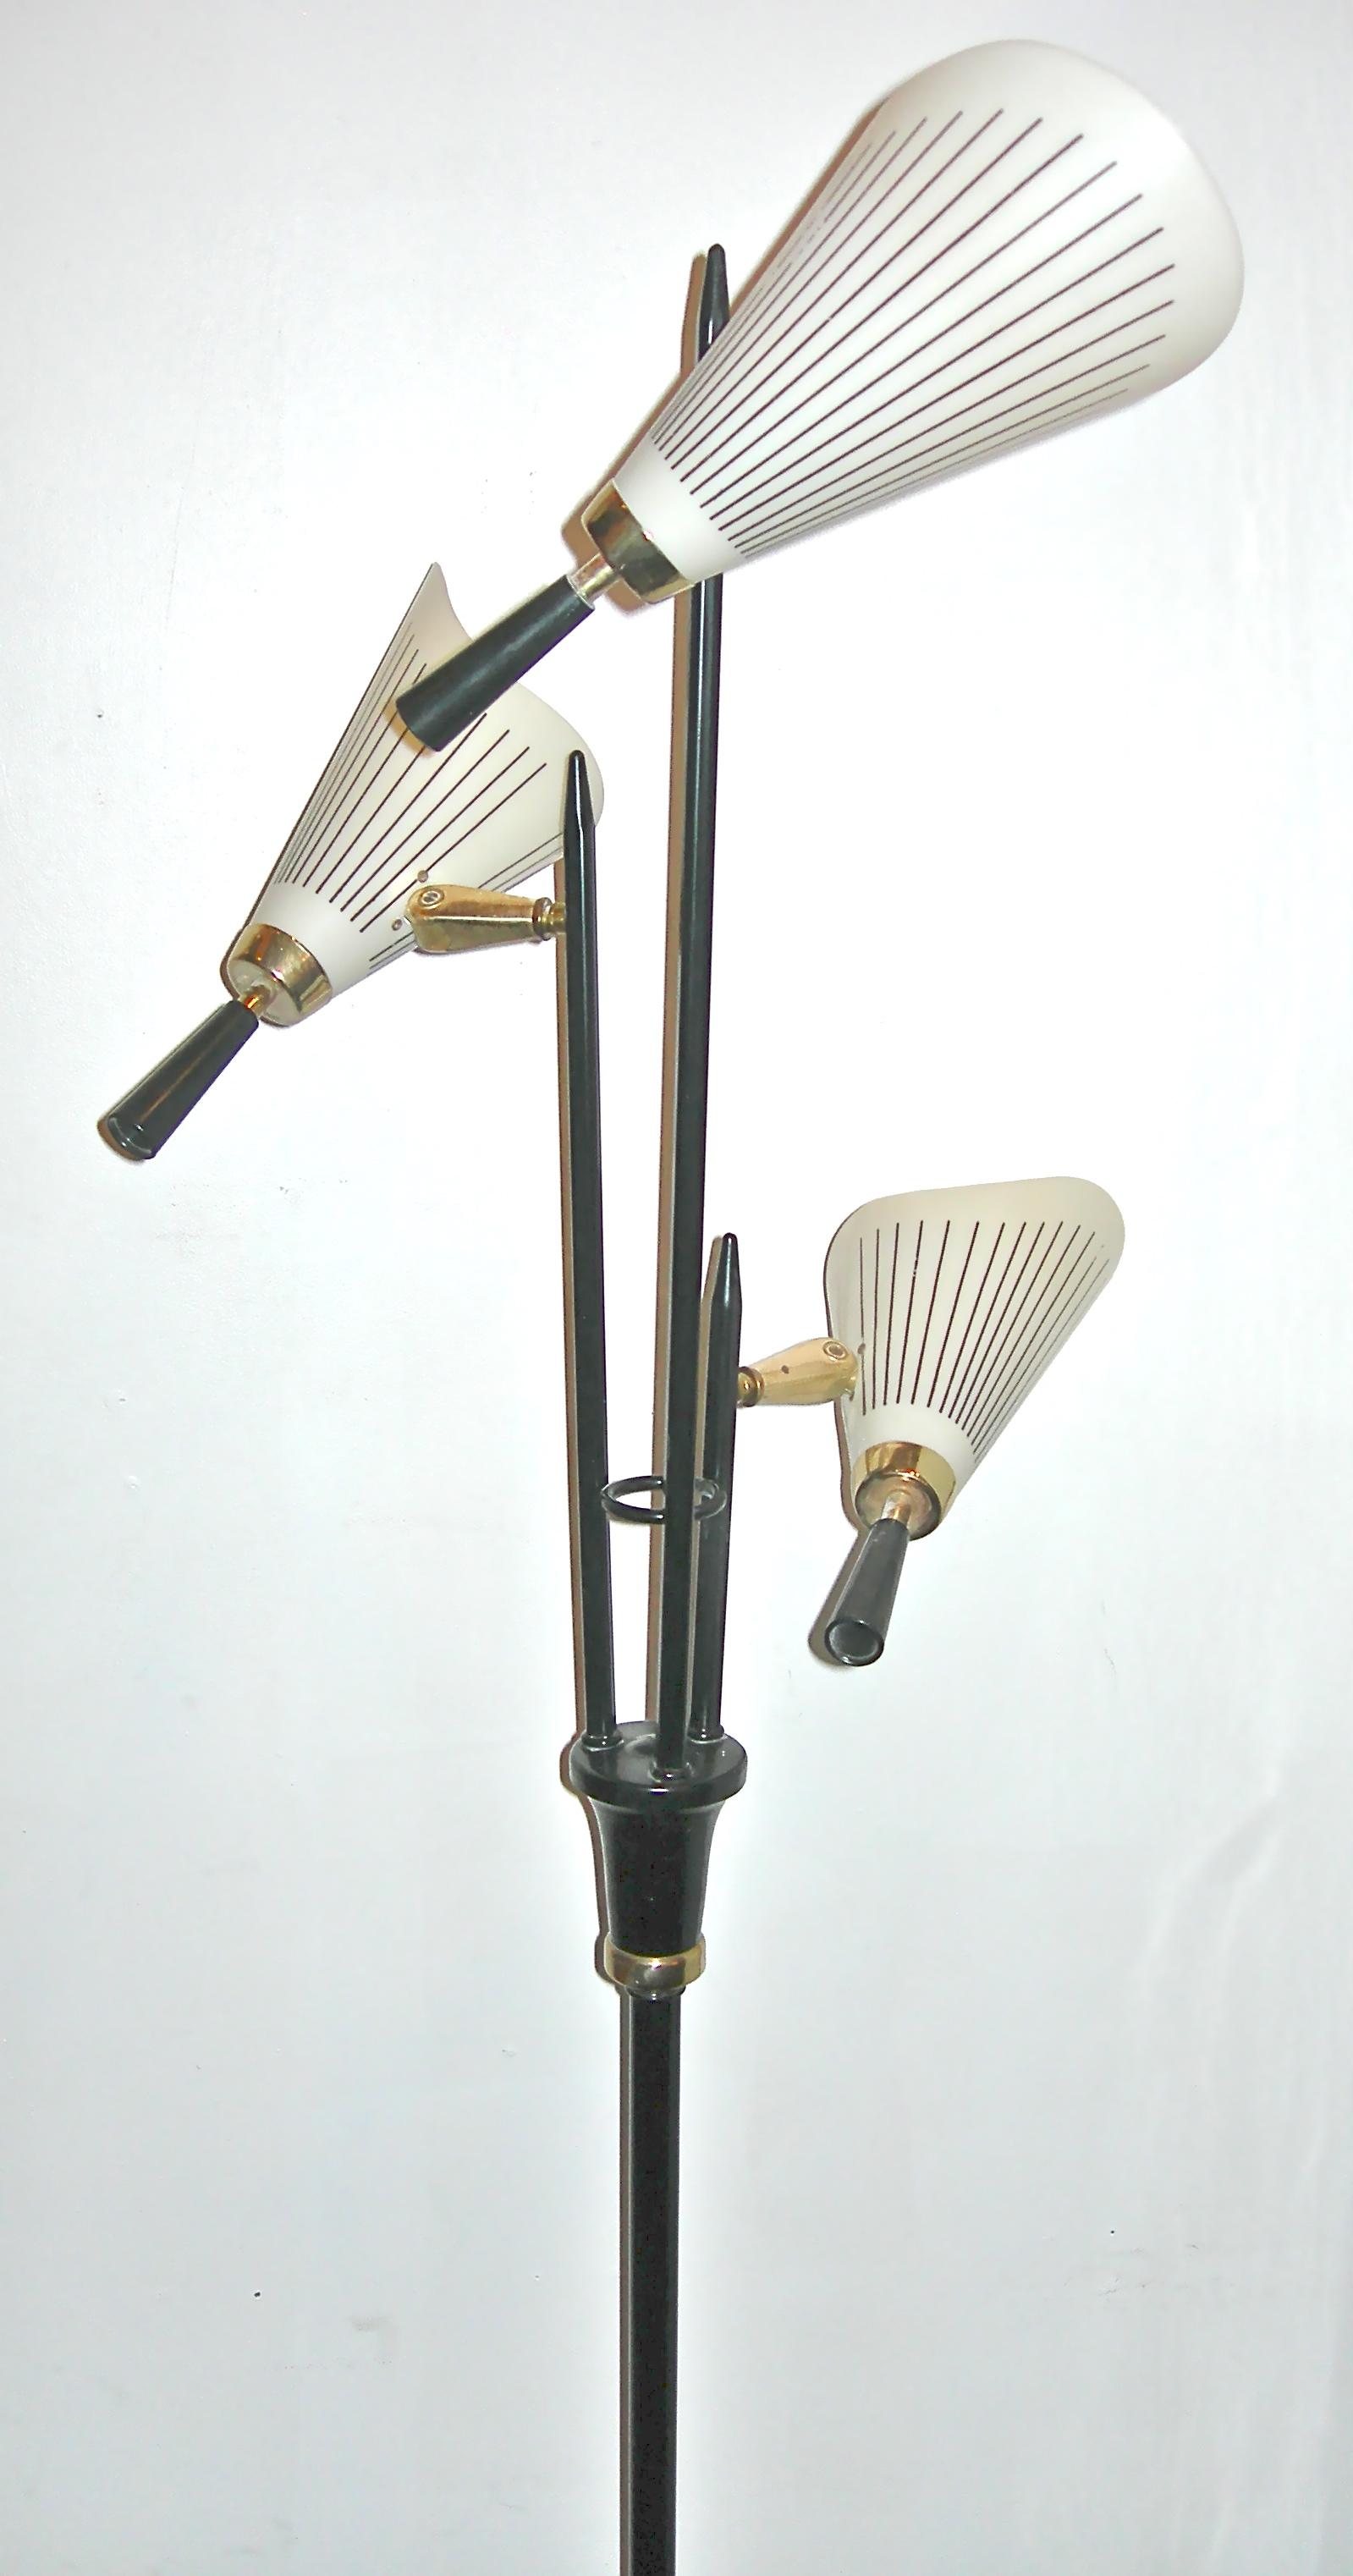 Vintage 3-headed cone floor lamp, SOLD